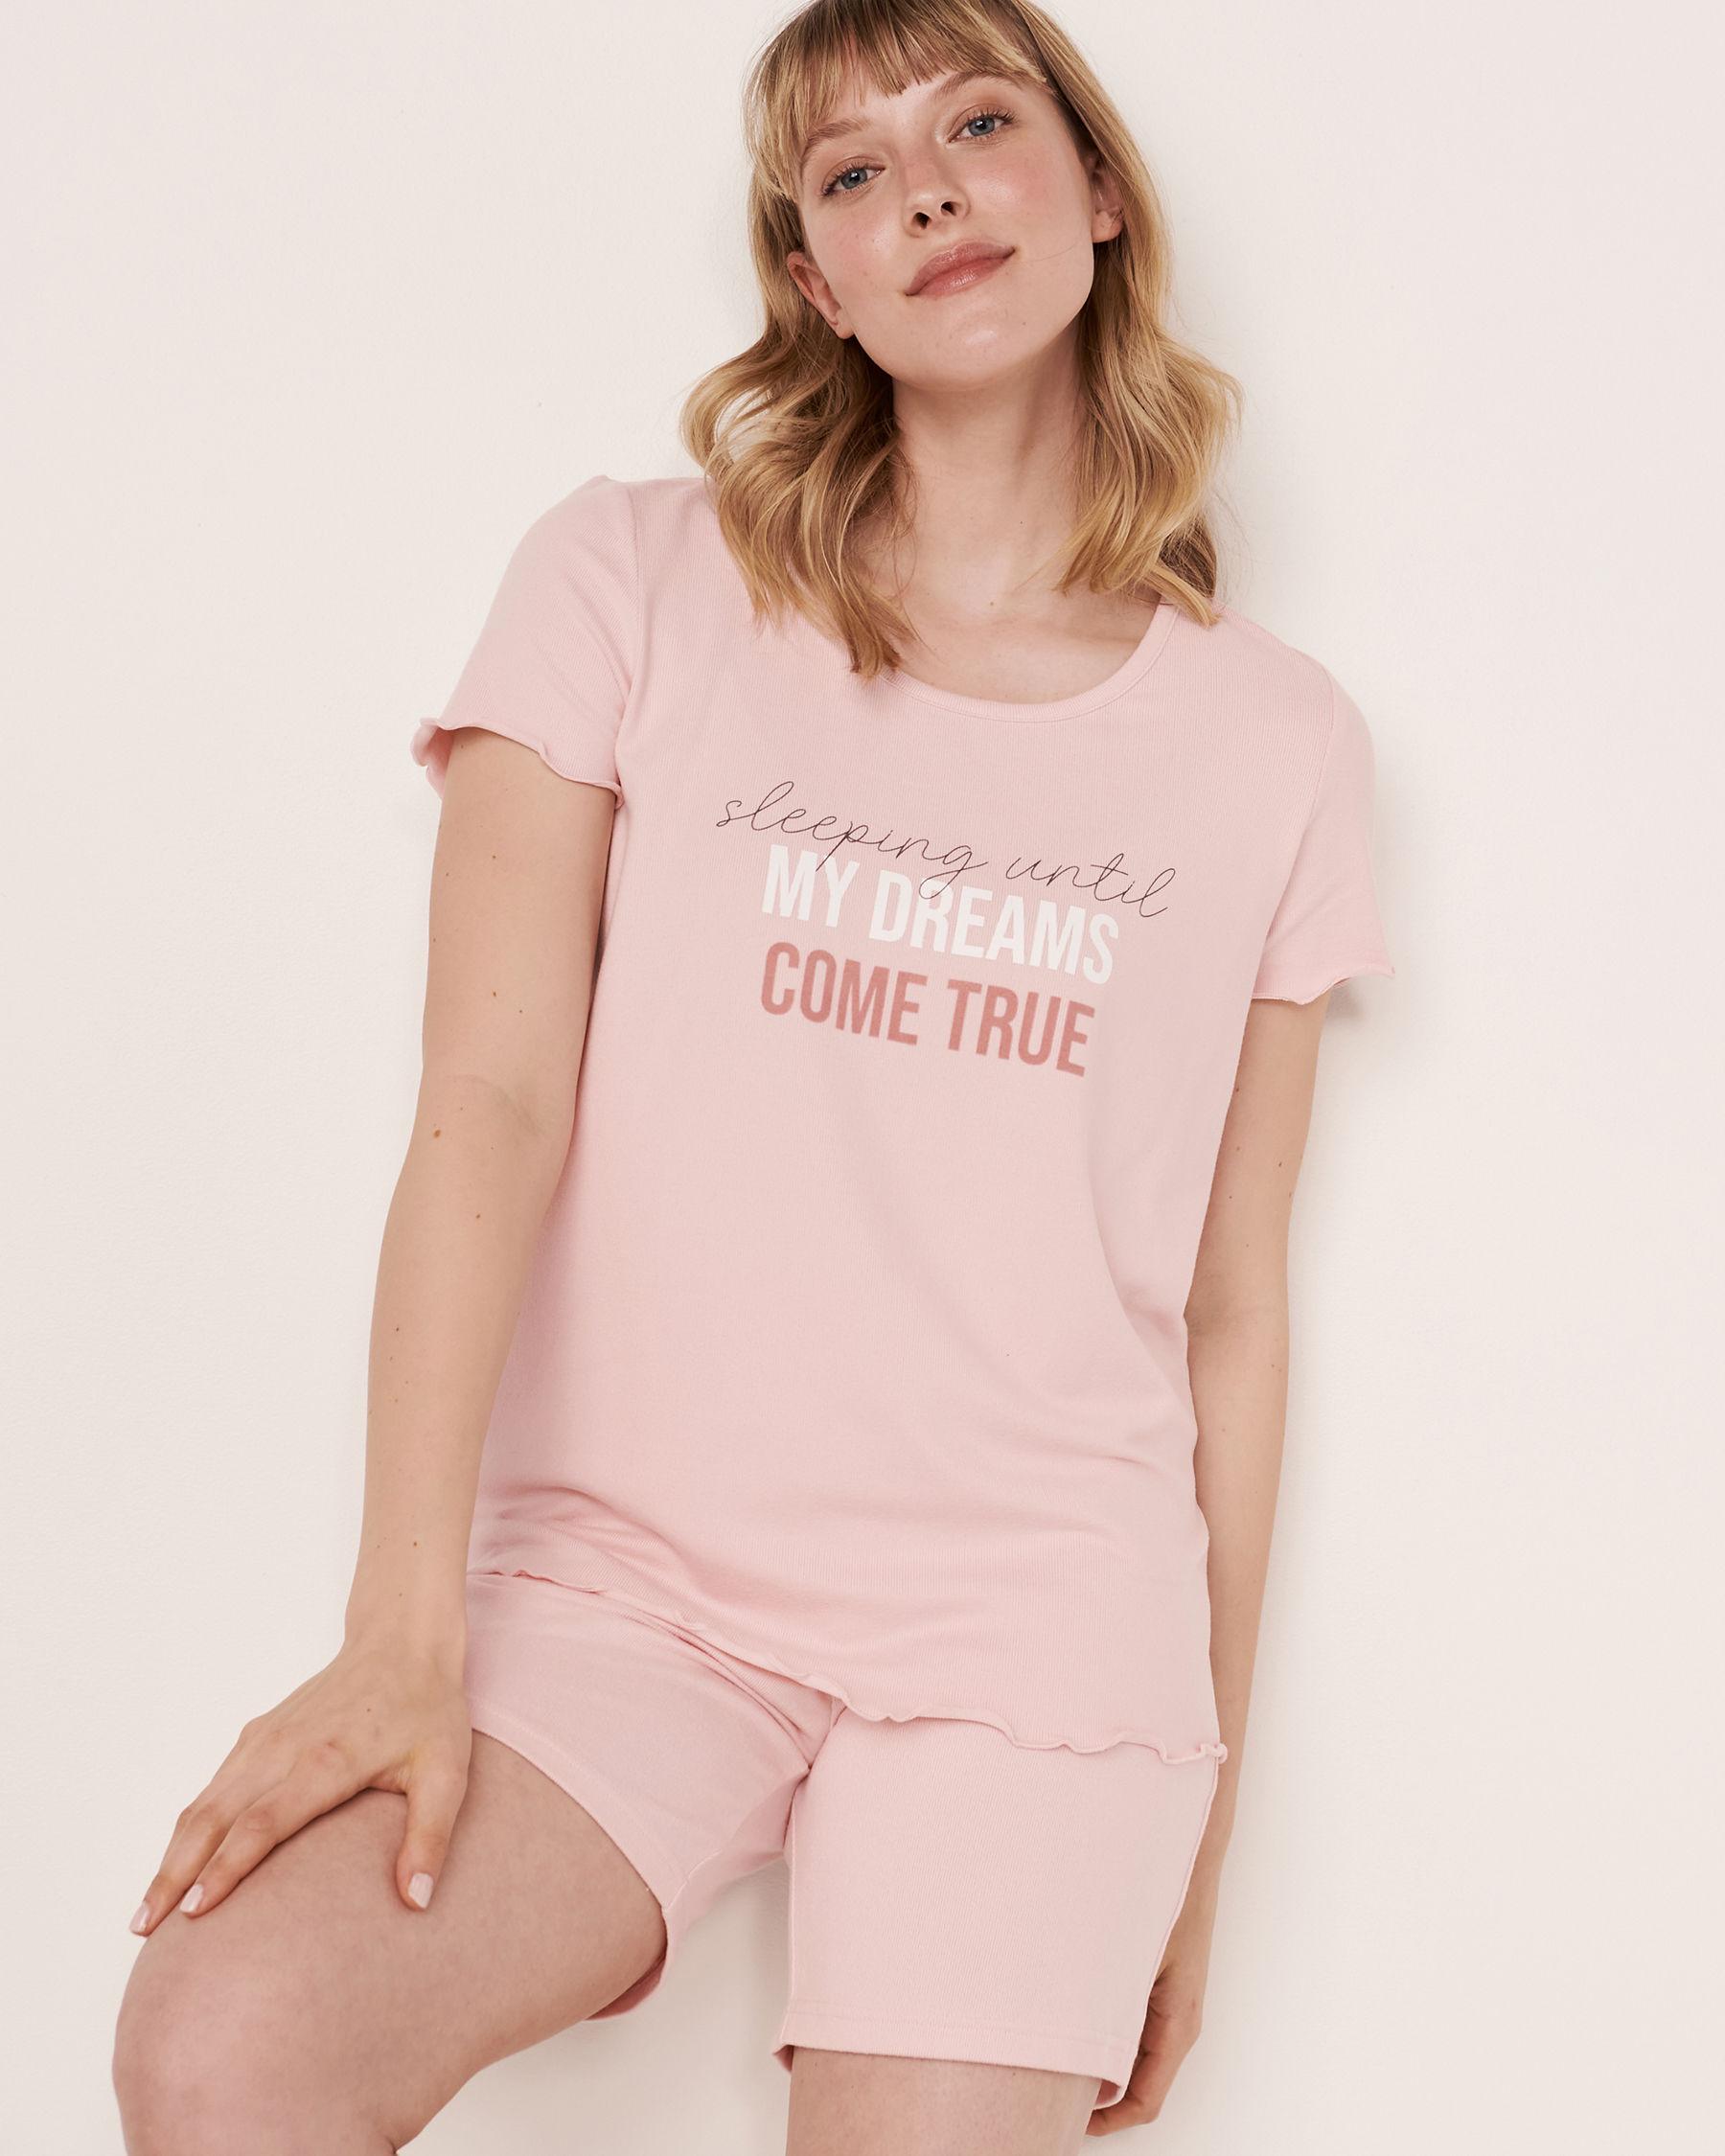 LA VIE EN ROSE Recycled Fibers Scoop Neck T-shirt Light pink 40100090 - View1